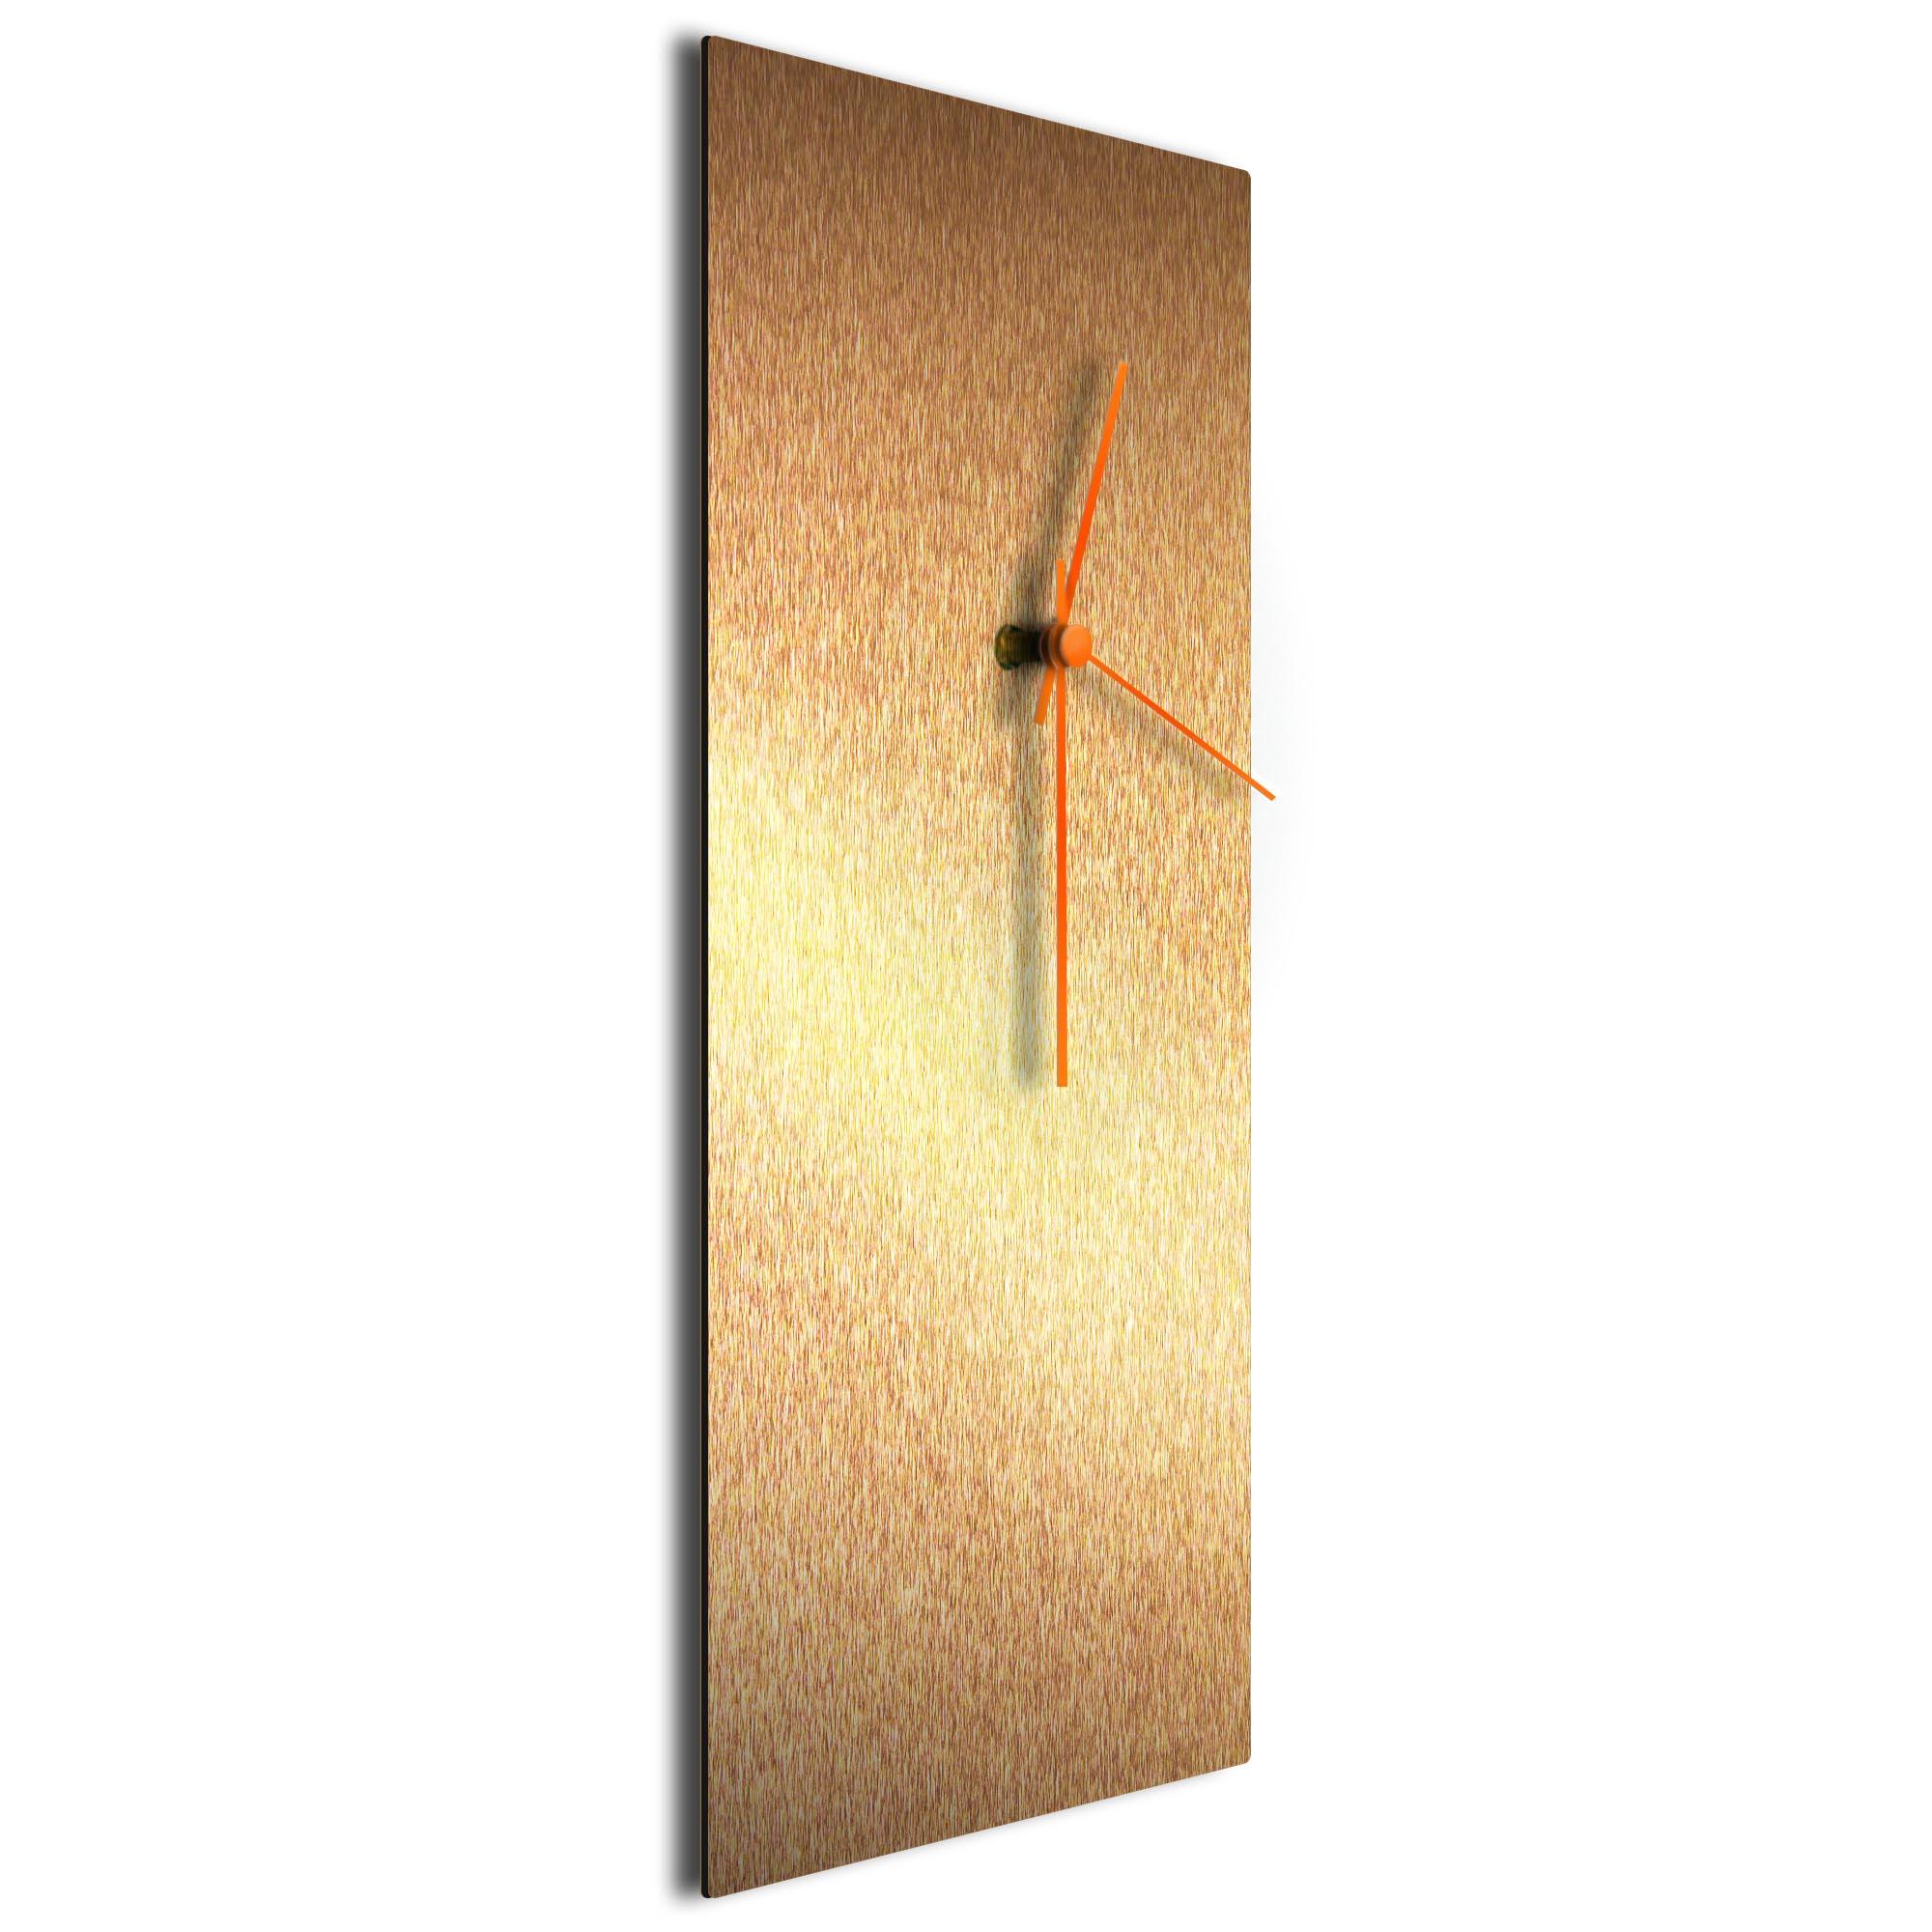 Bronzesmith Clock Large Orange - Image 2